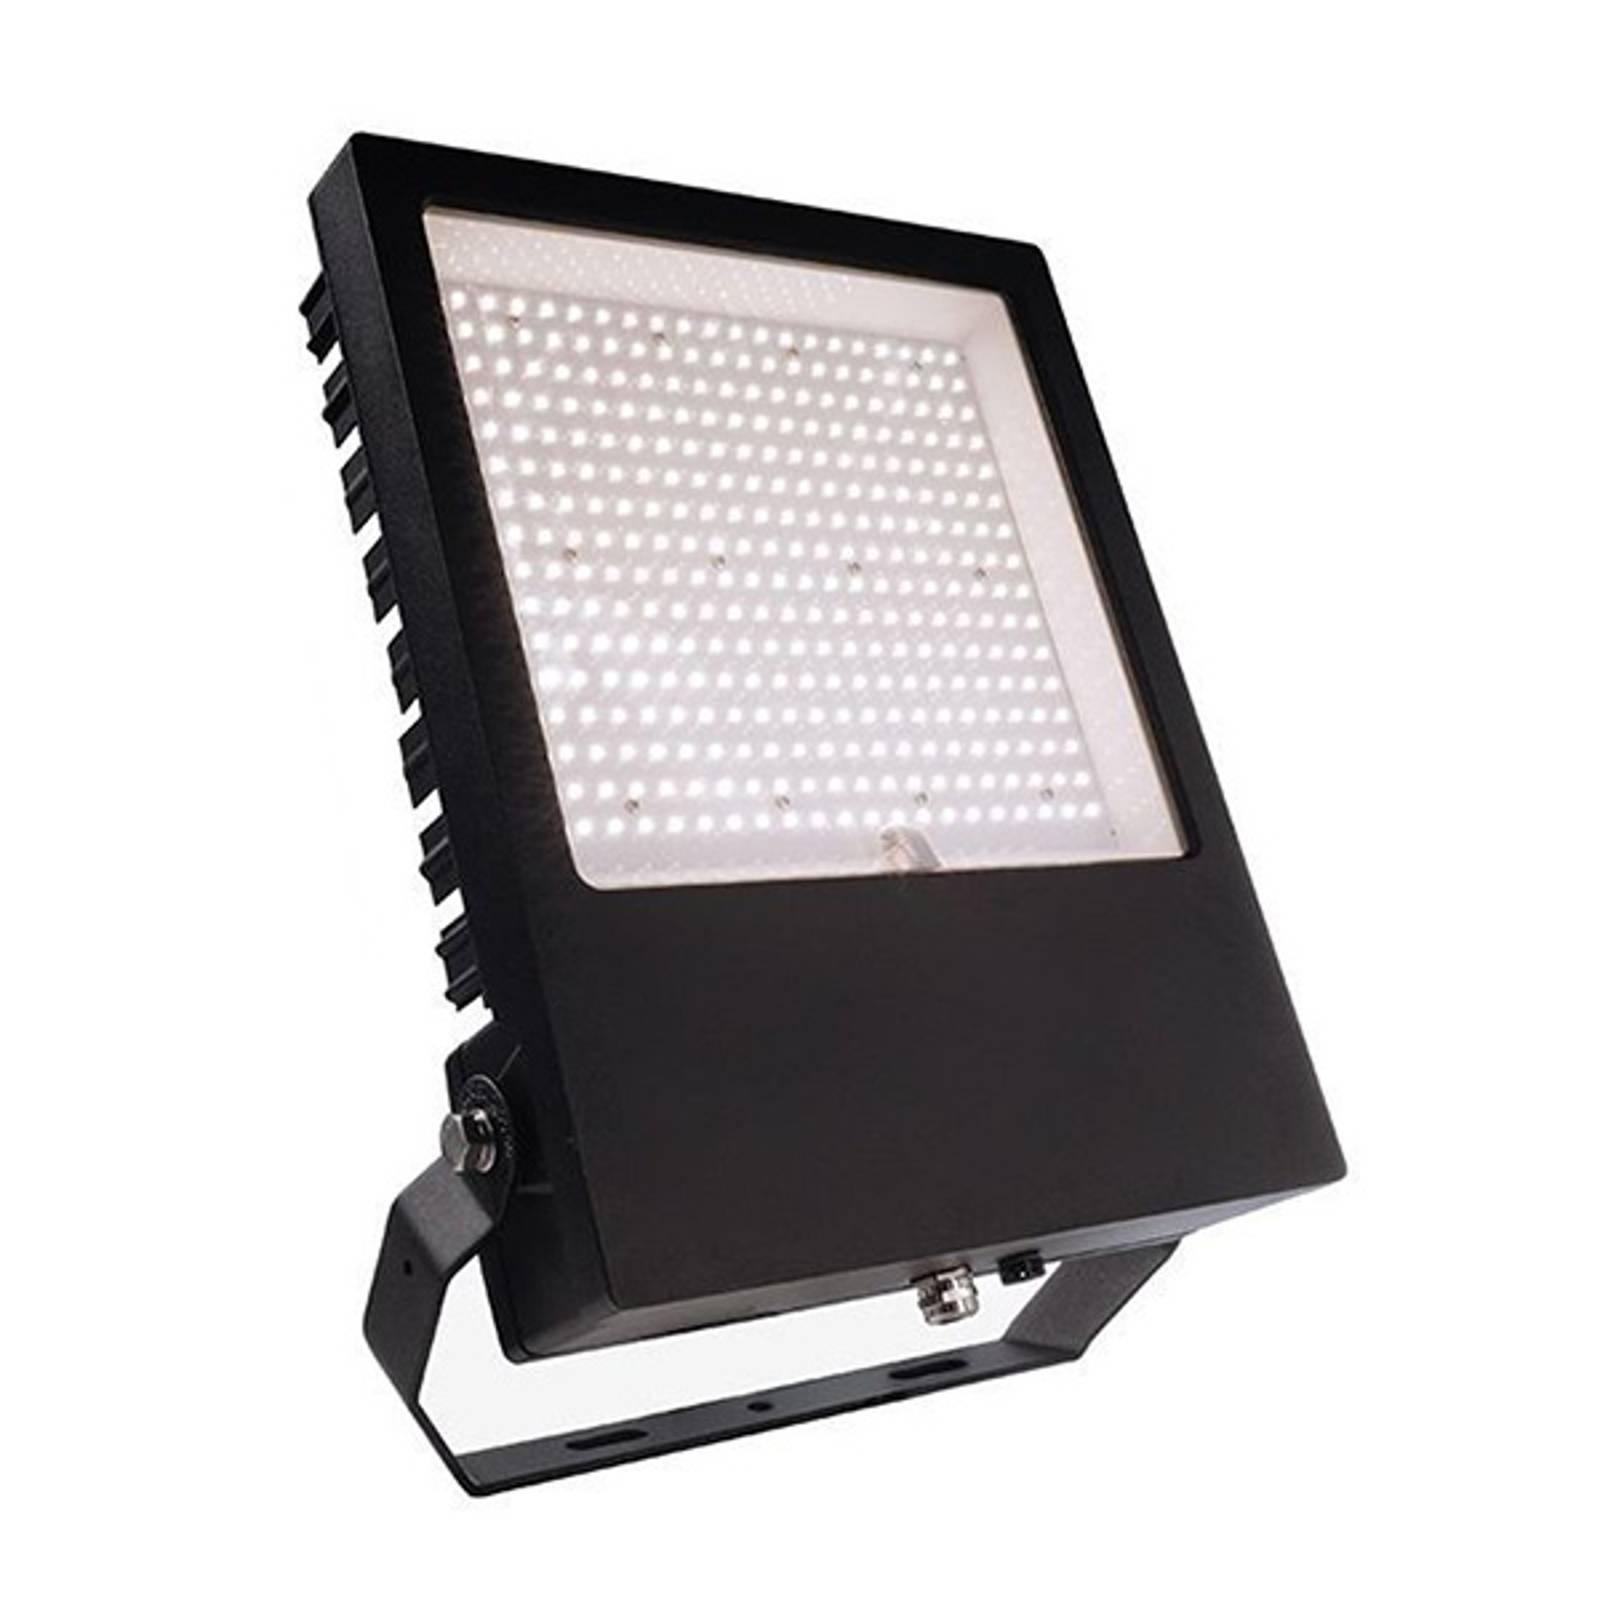 LED-Außenstrahler Atik, 300 W, 4.000 K